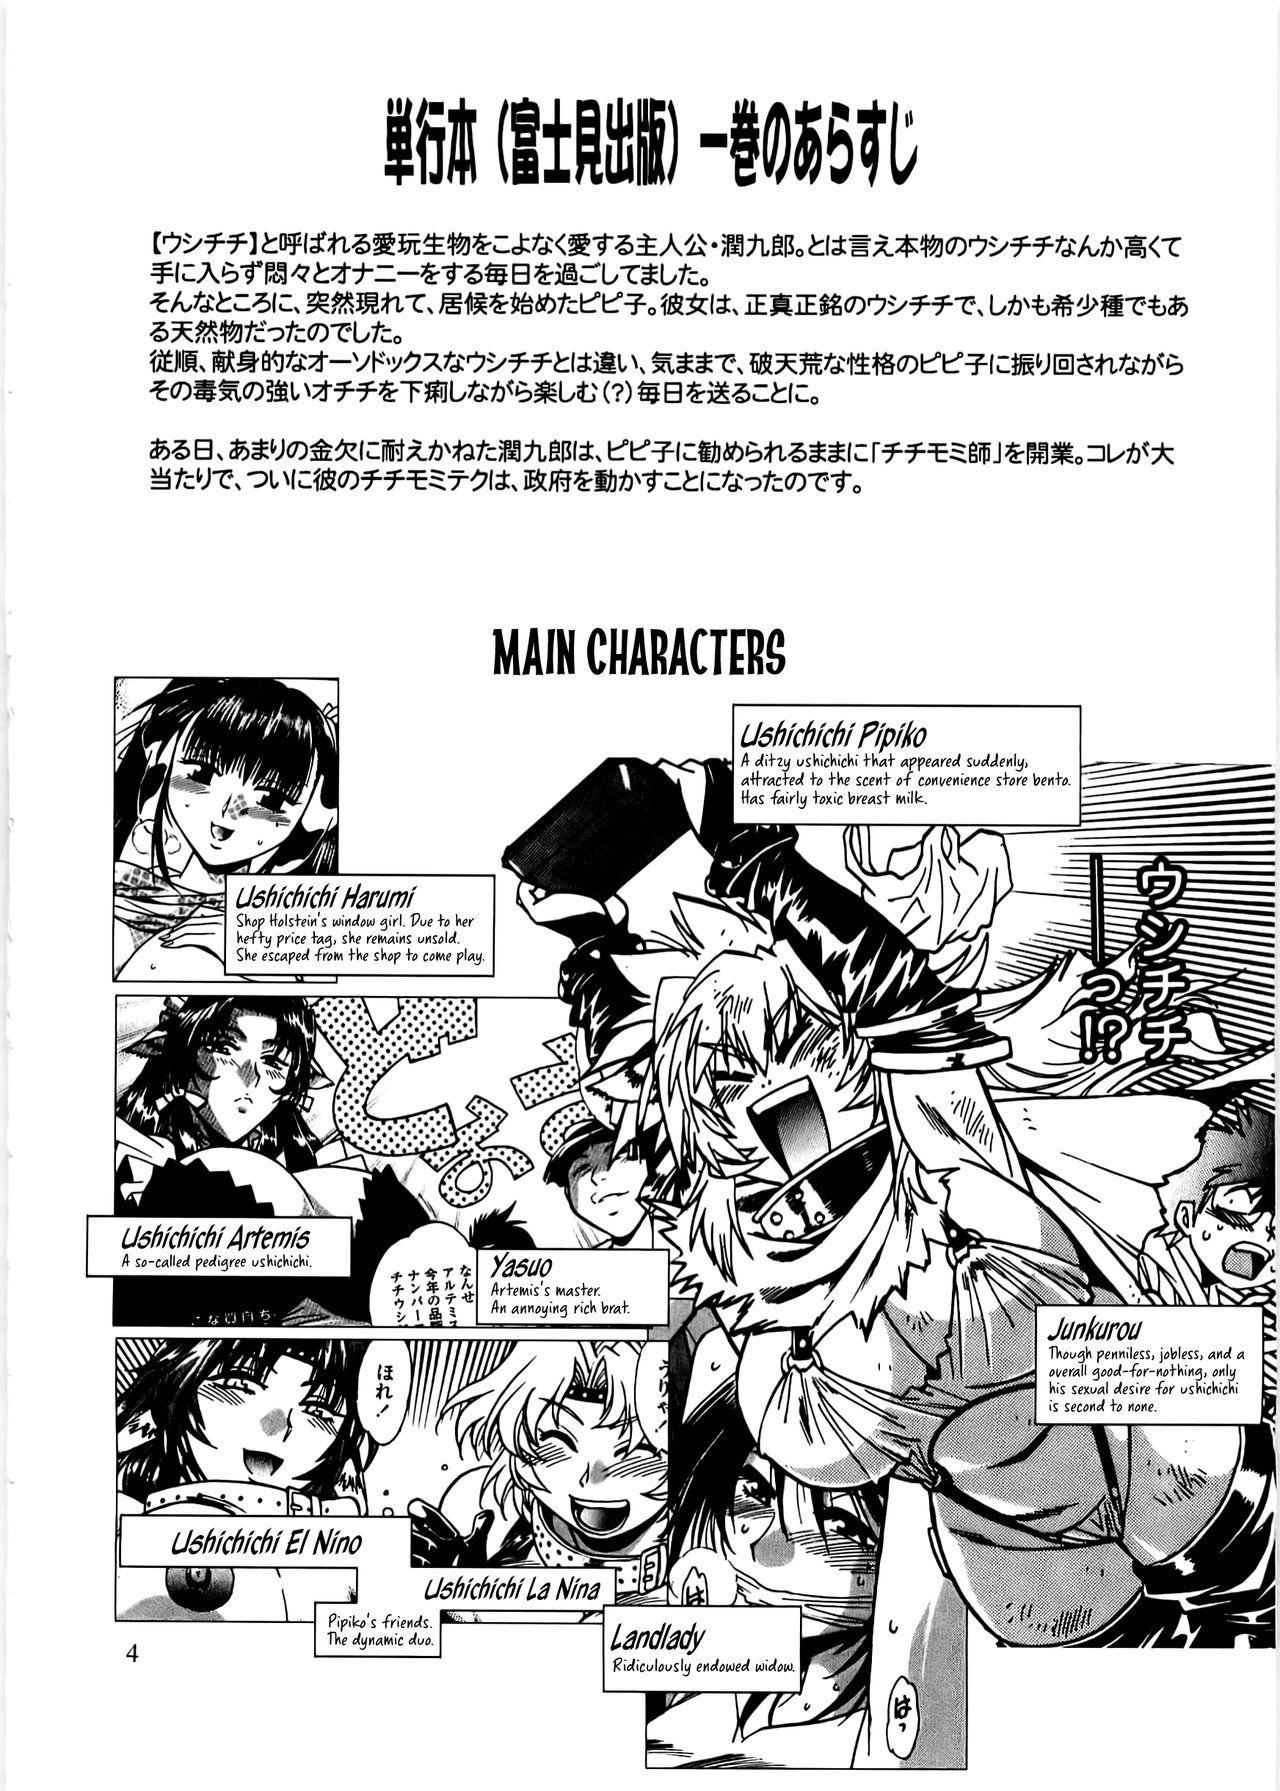 (C76) [Studio Katsudon (Manabe Jouji)] Koisuru Ushi-Chichi - Dear My Ushi-Chichi 2 [English] 2